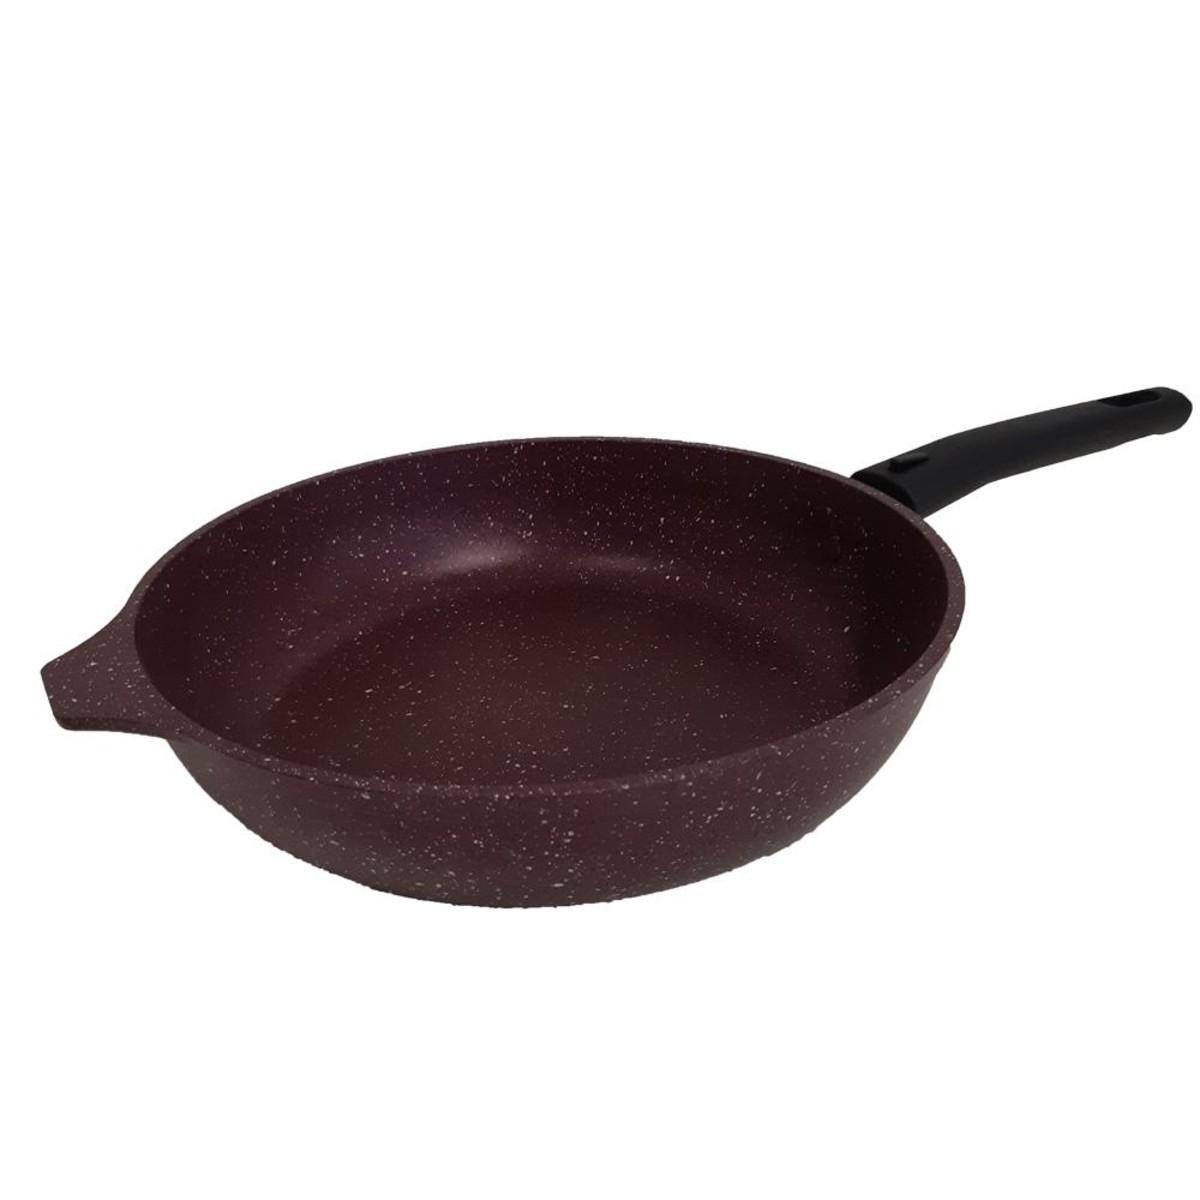 Сковорода универсальная Kukmara Trendy style 221tsm 22 см